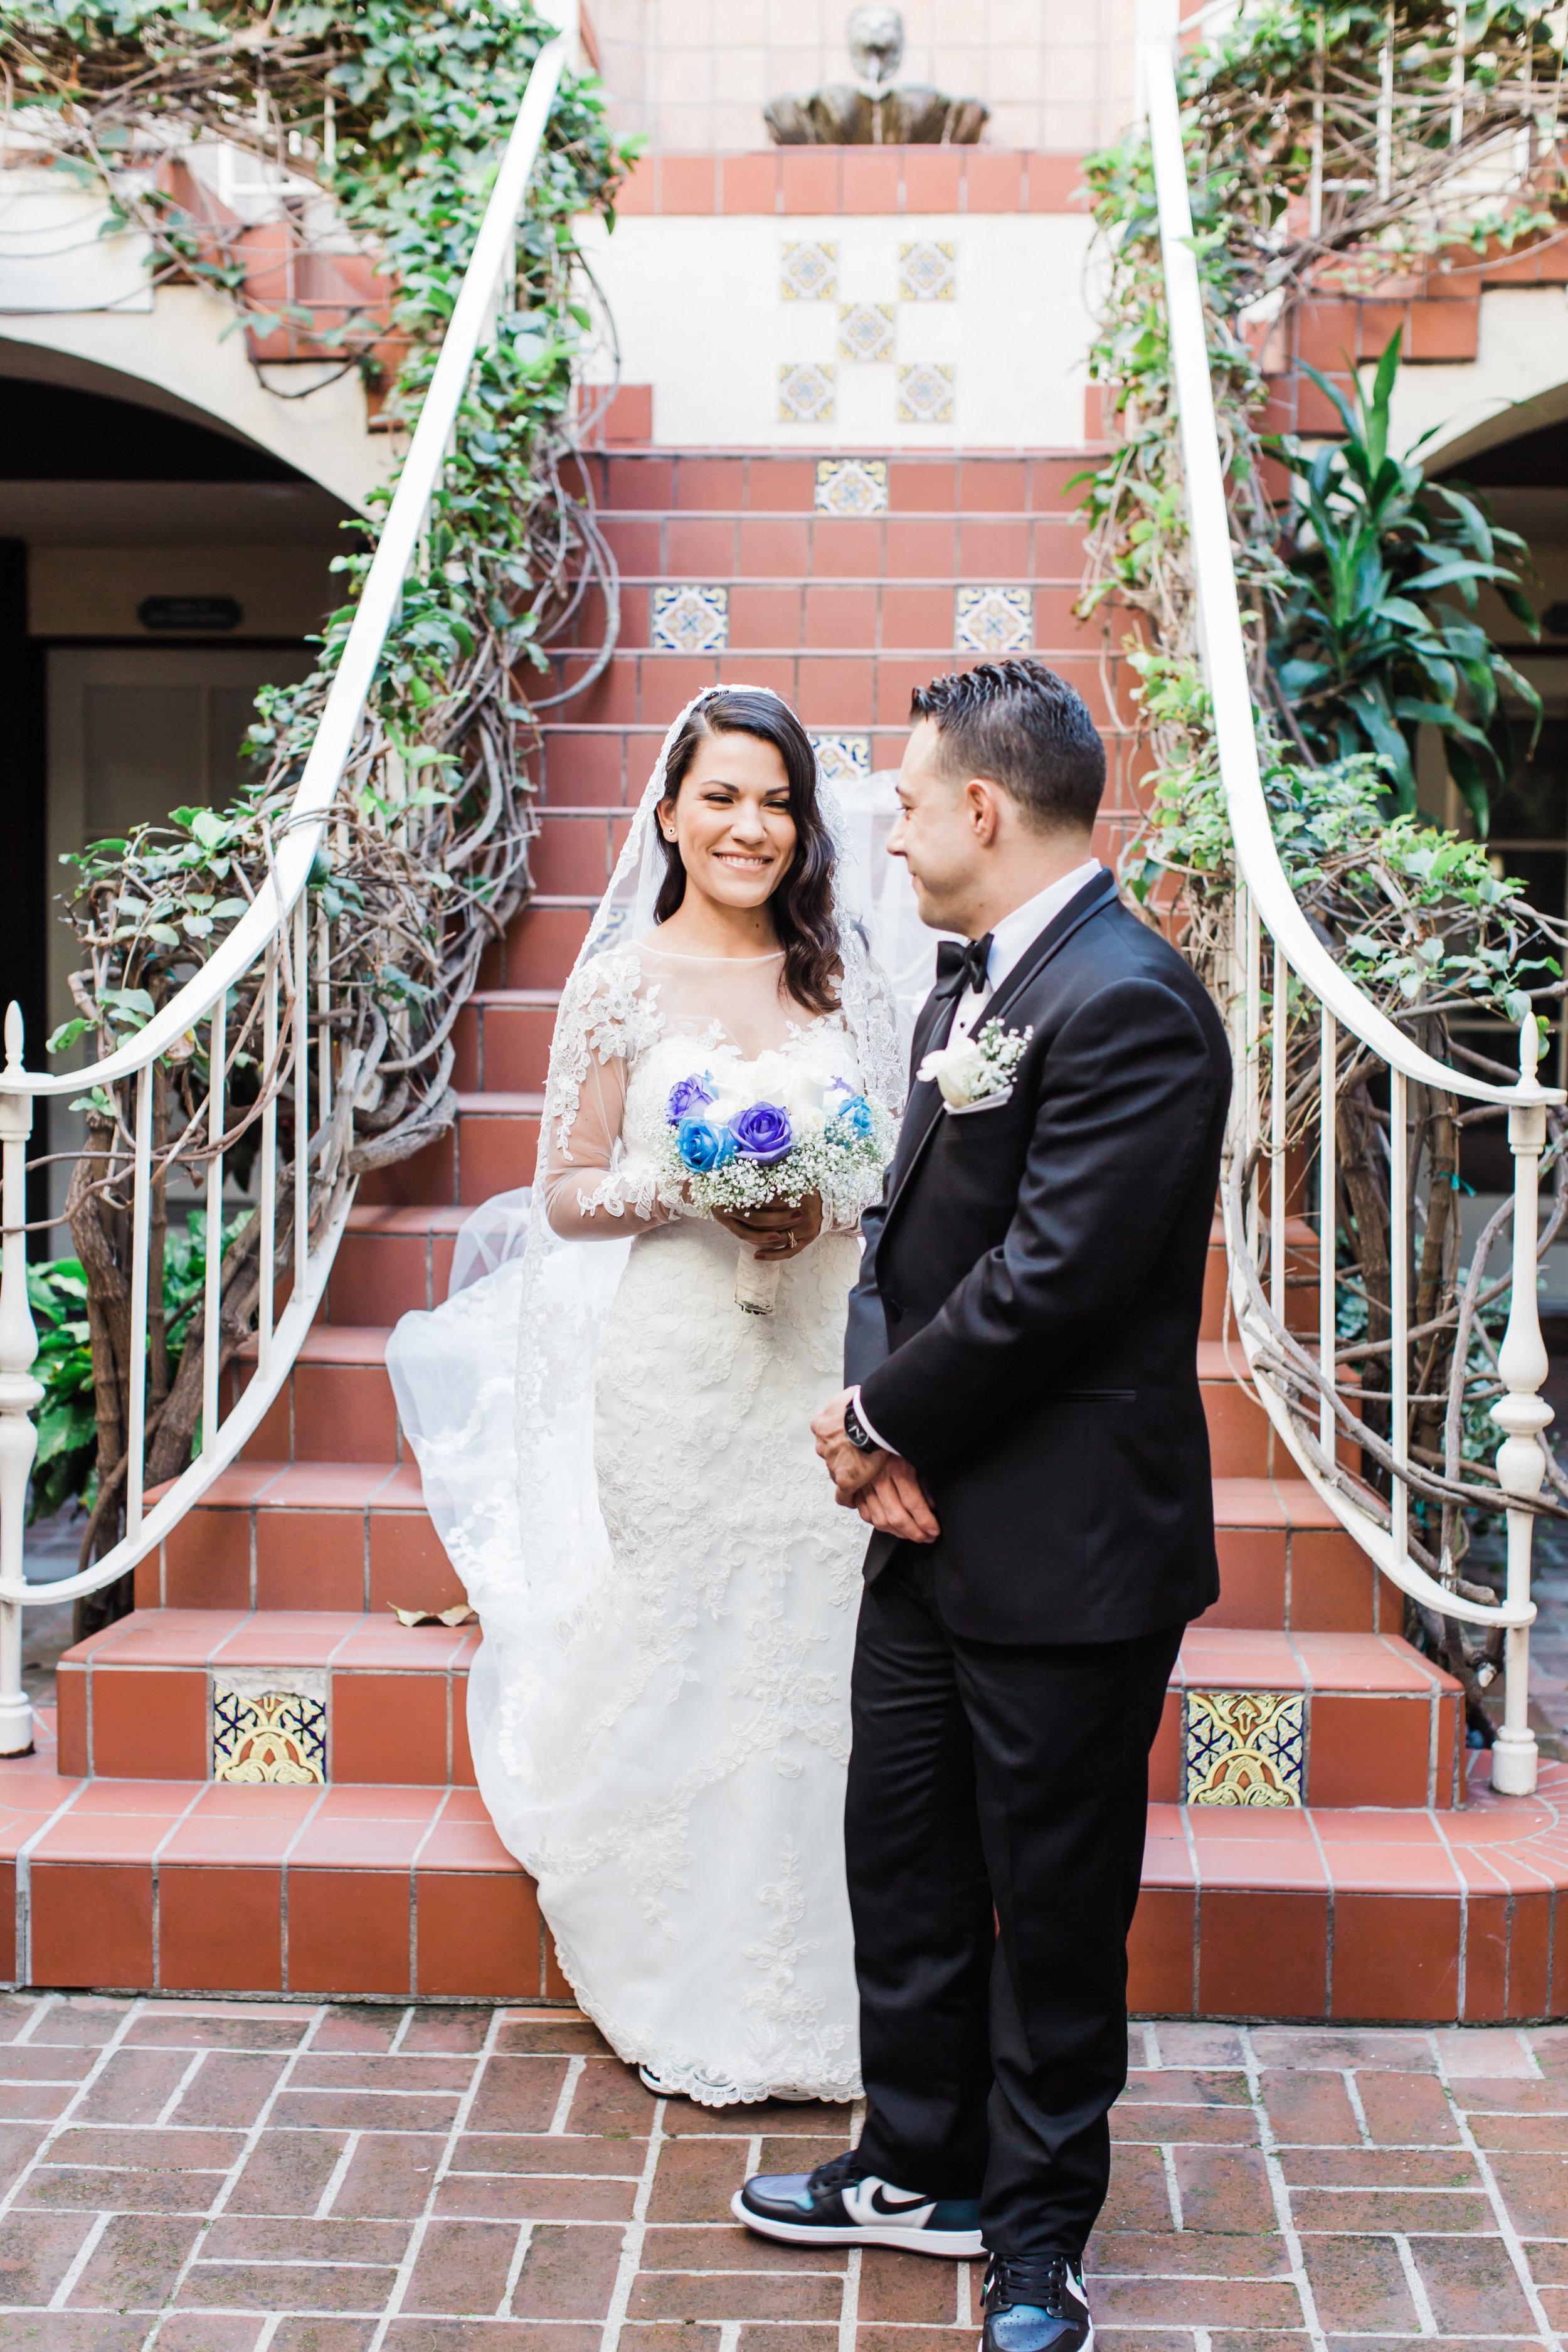 Erica and Adrian-2391.jpg